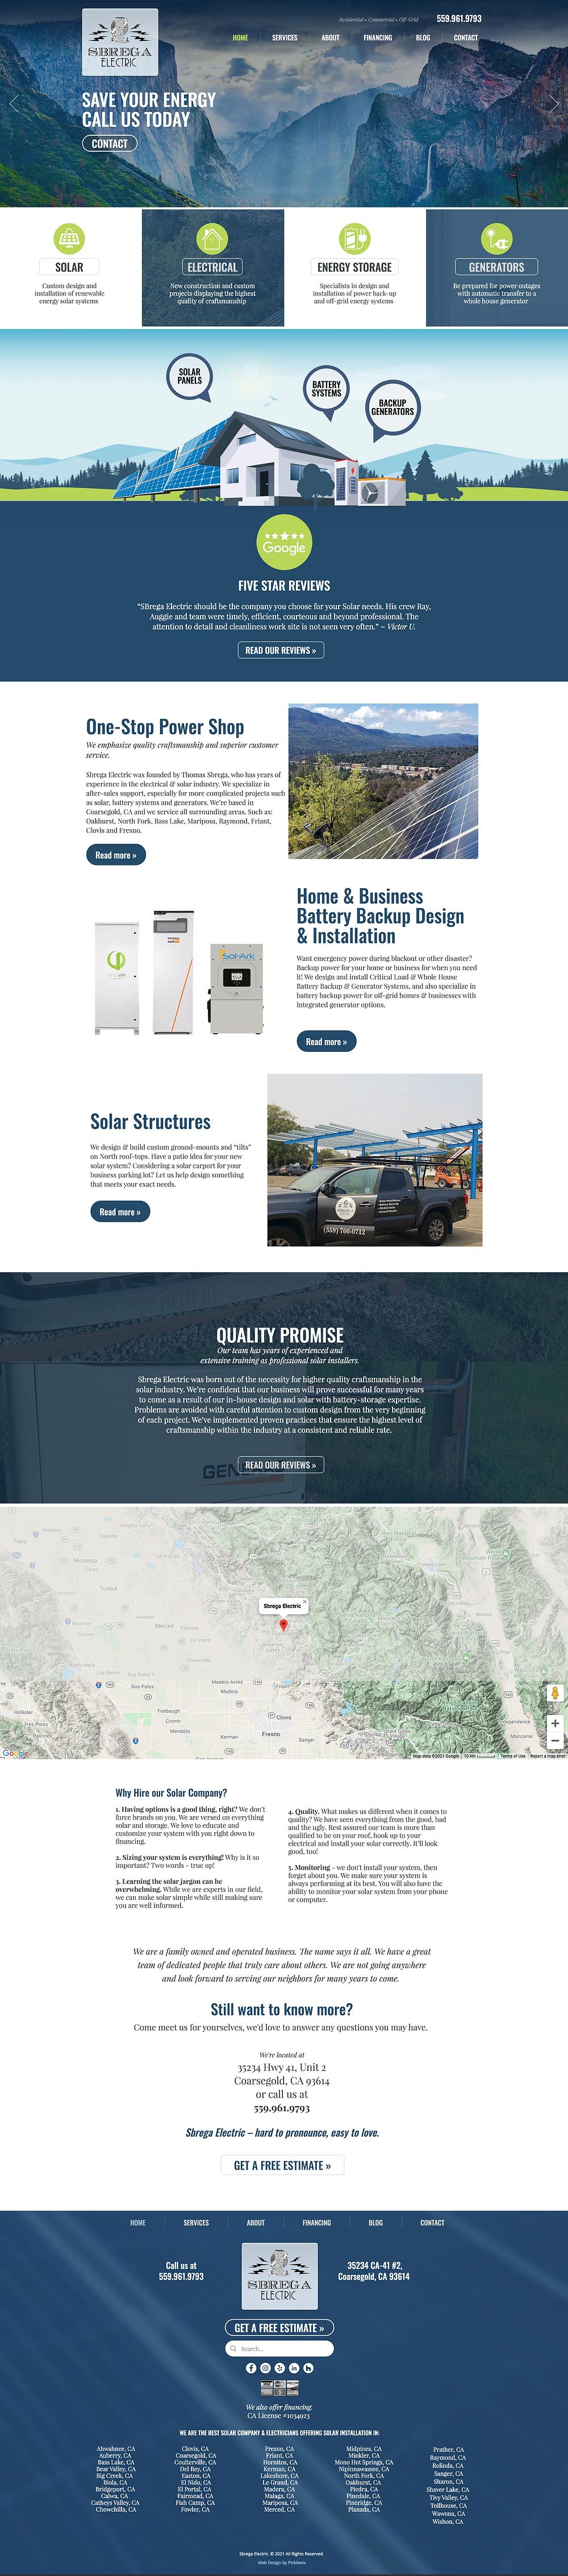 Solar Company Web Designer - Website Design for Sbrega Electric in California - Homepage Screenshot